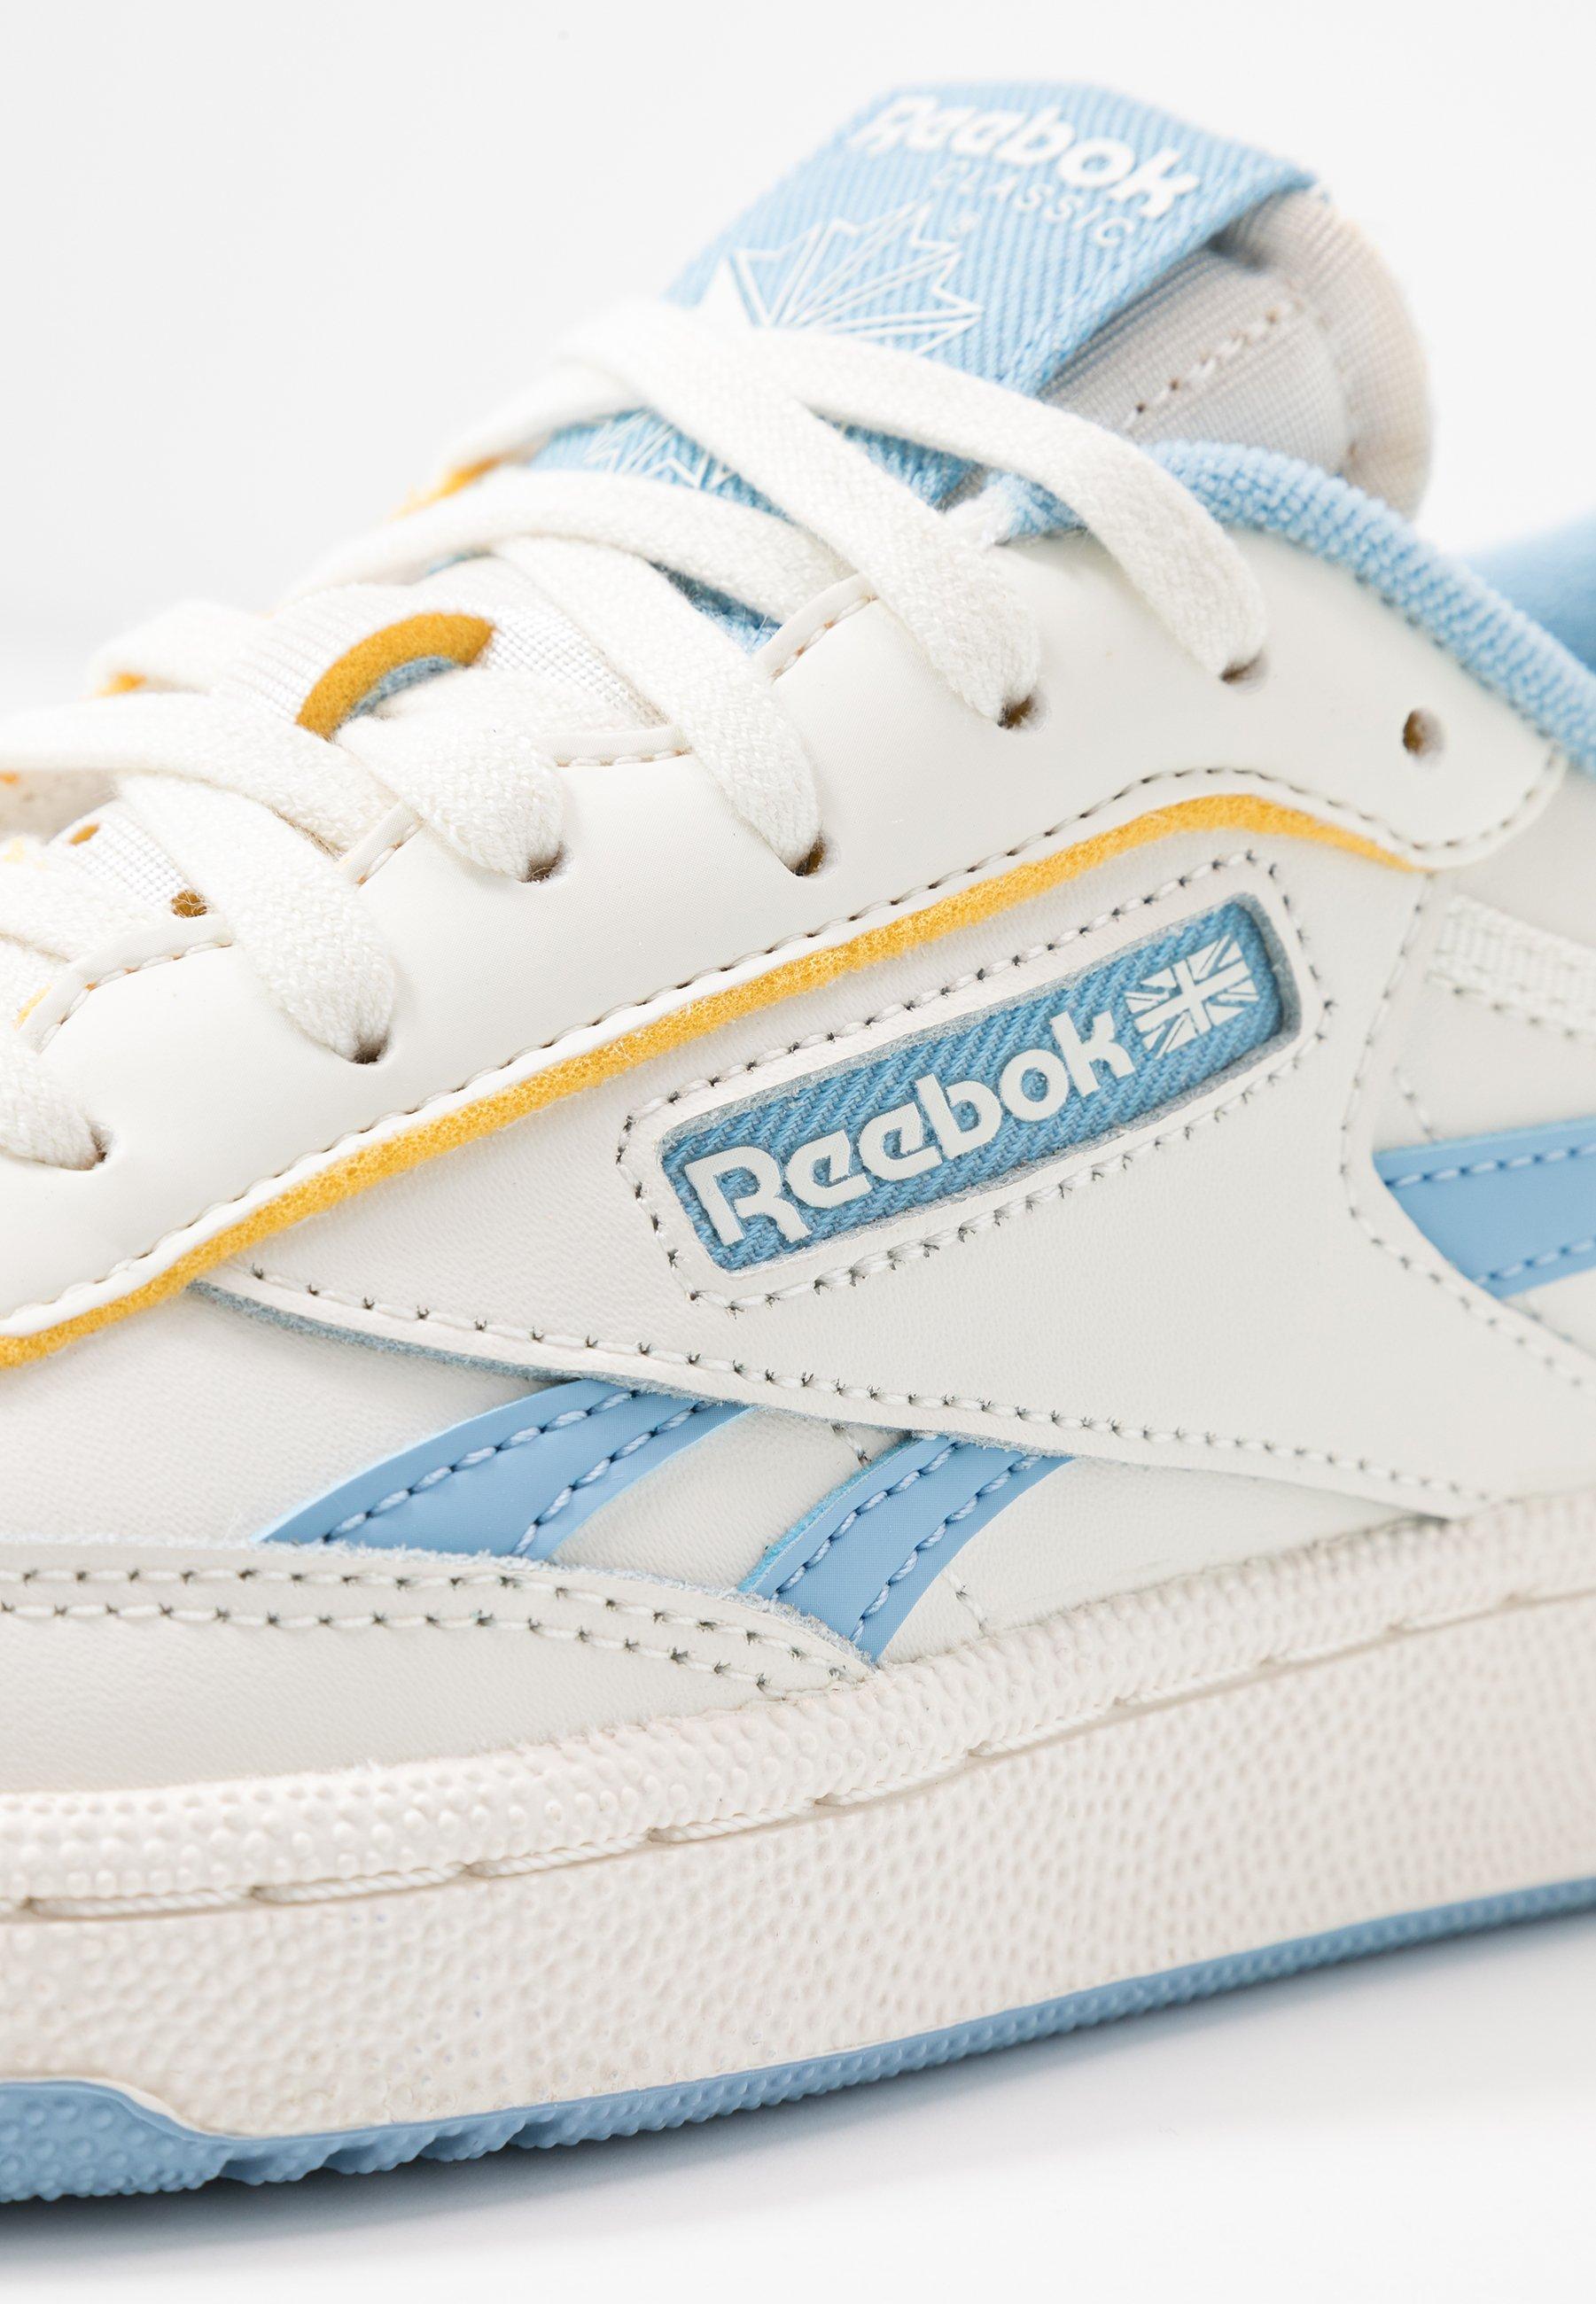 CLUB C REVENGE Sneakers laag chalkfluid blue